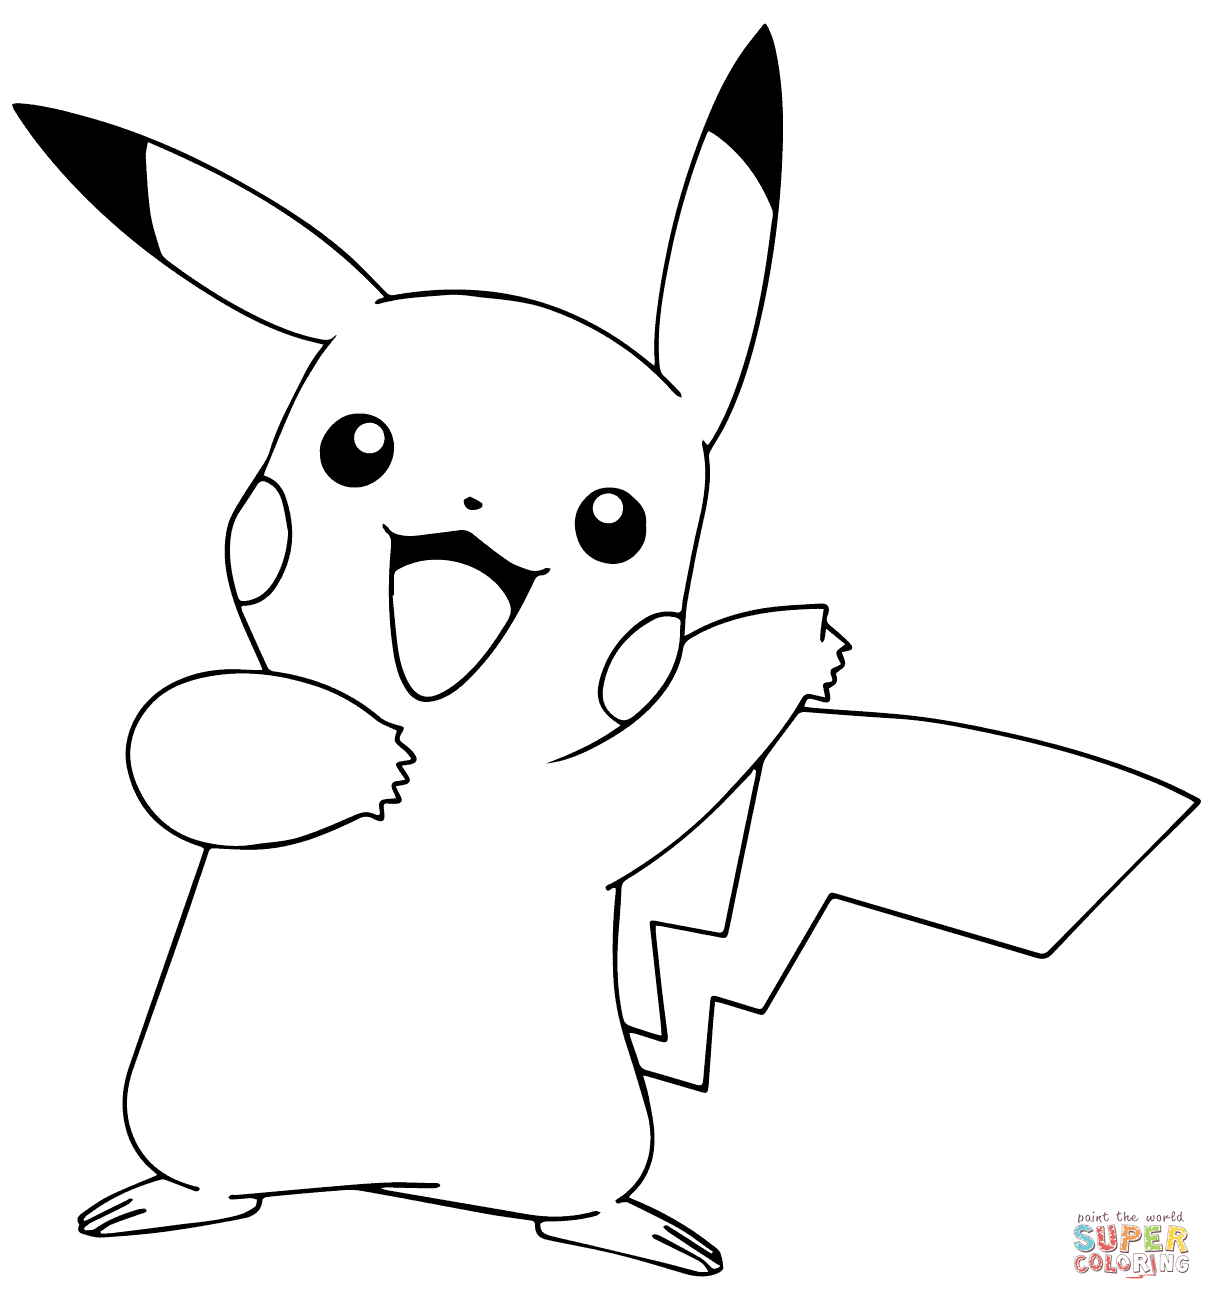 Pikachu From Pokemon Go Pokemon Coloring Sheets Pikachu Coloring Page Pokemon Coloring